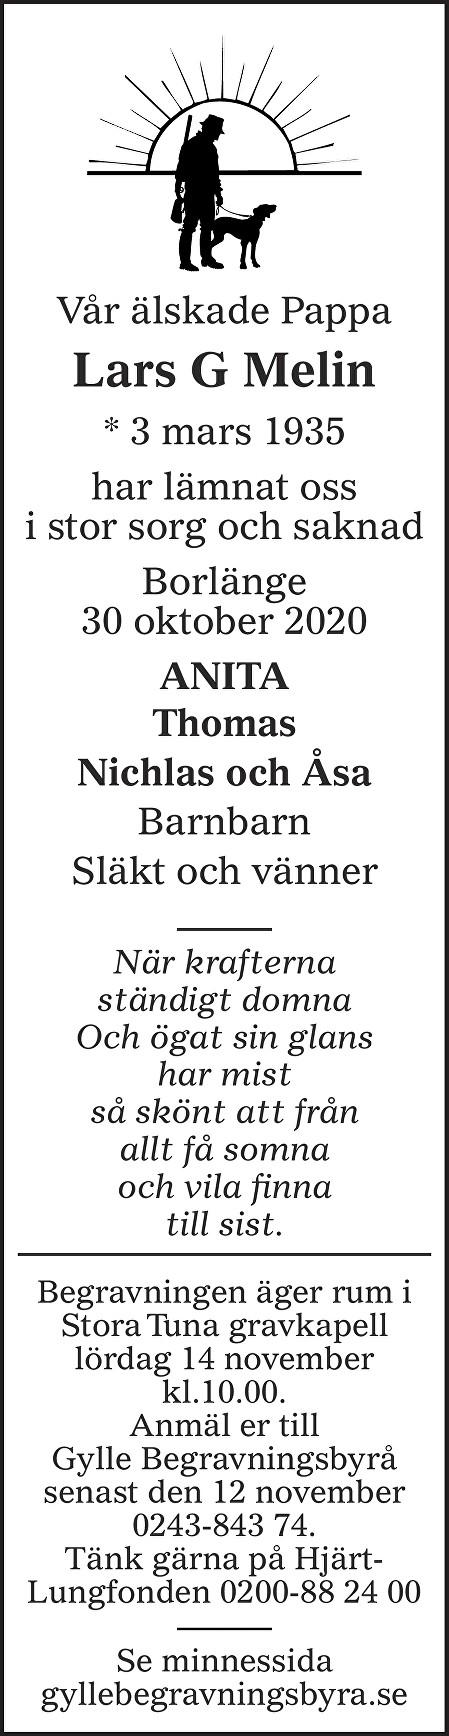 Lars G Melin Death notice